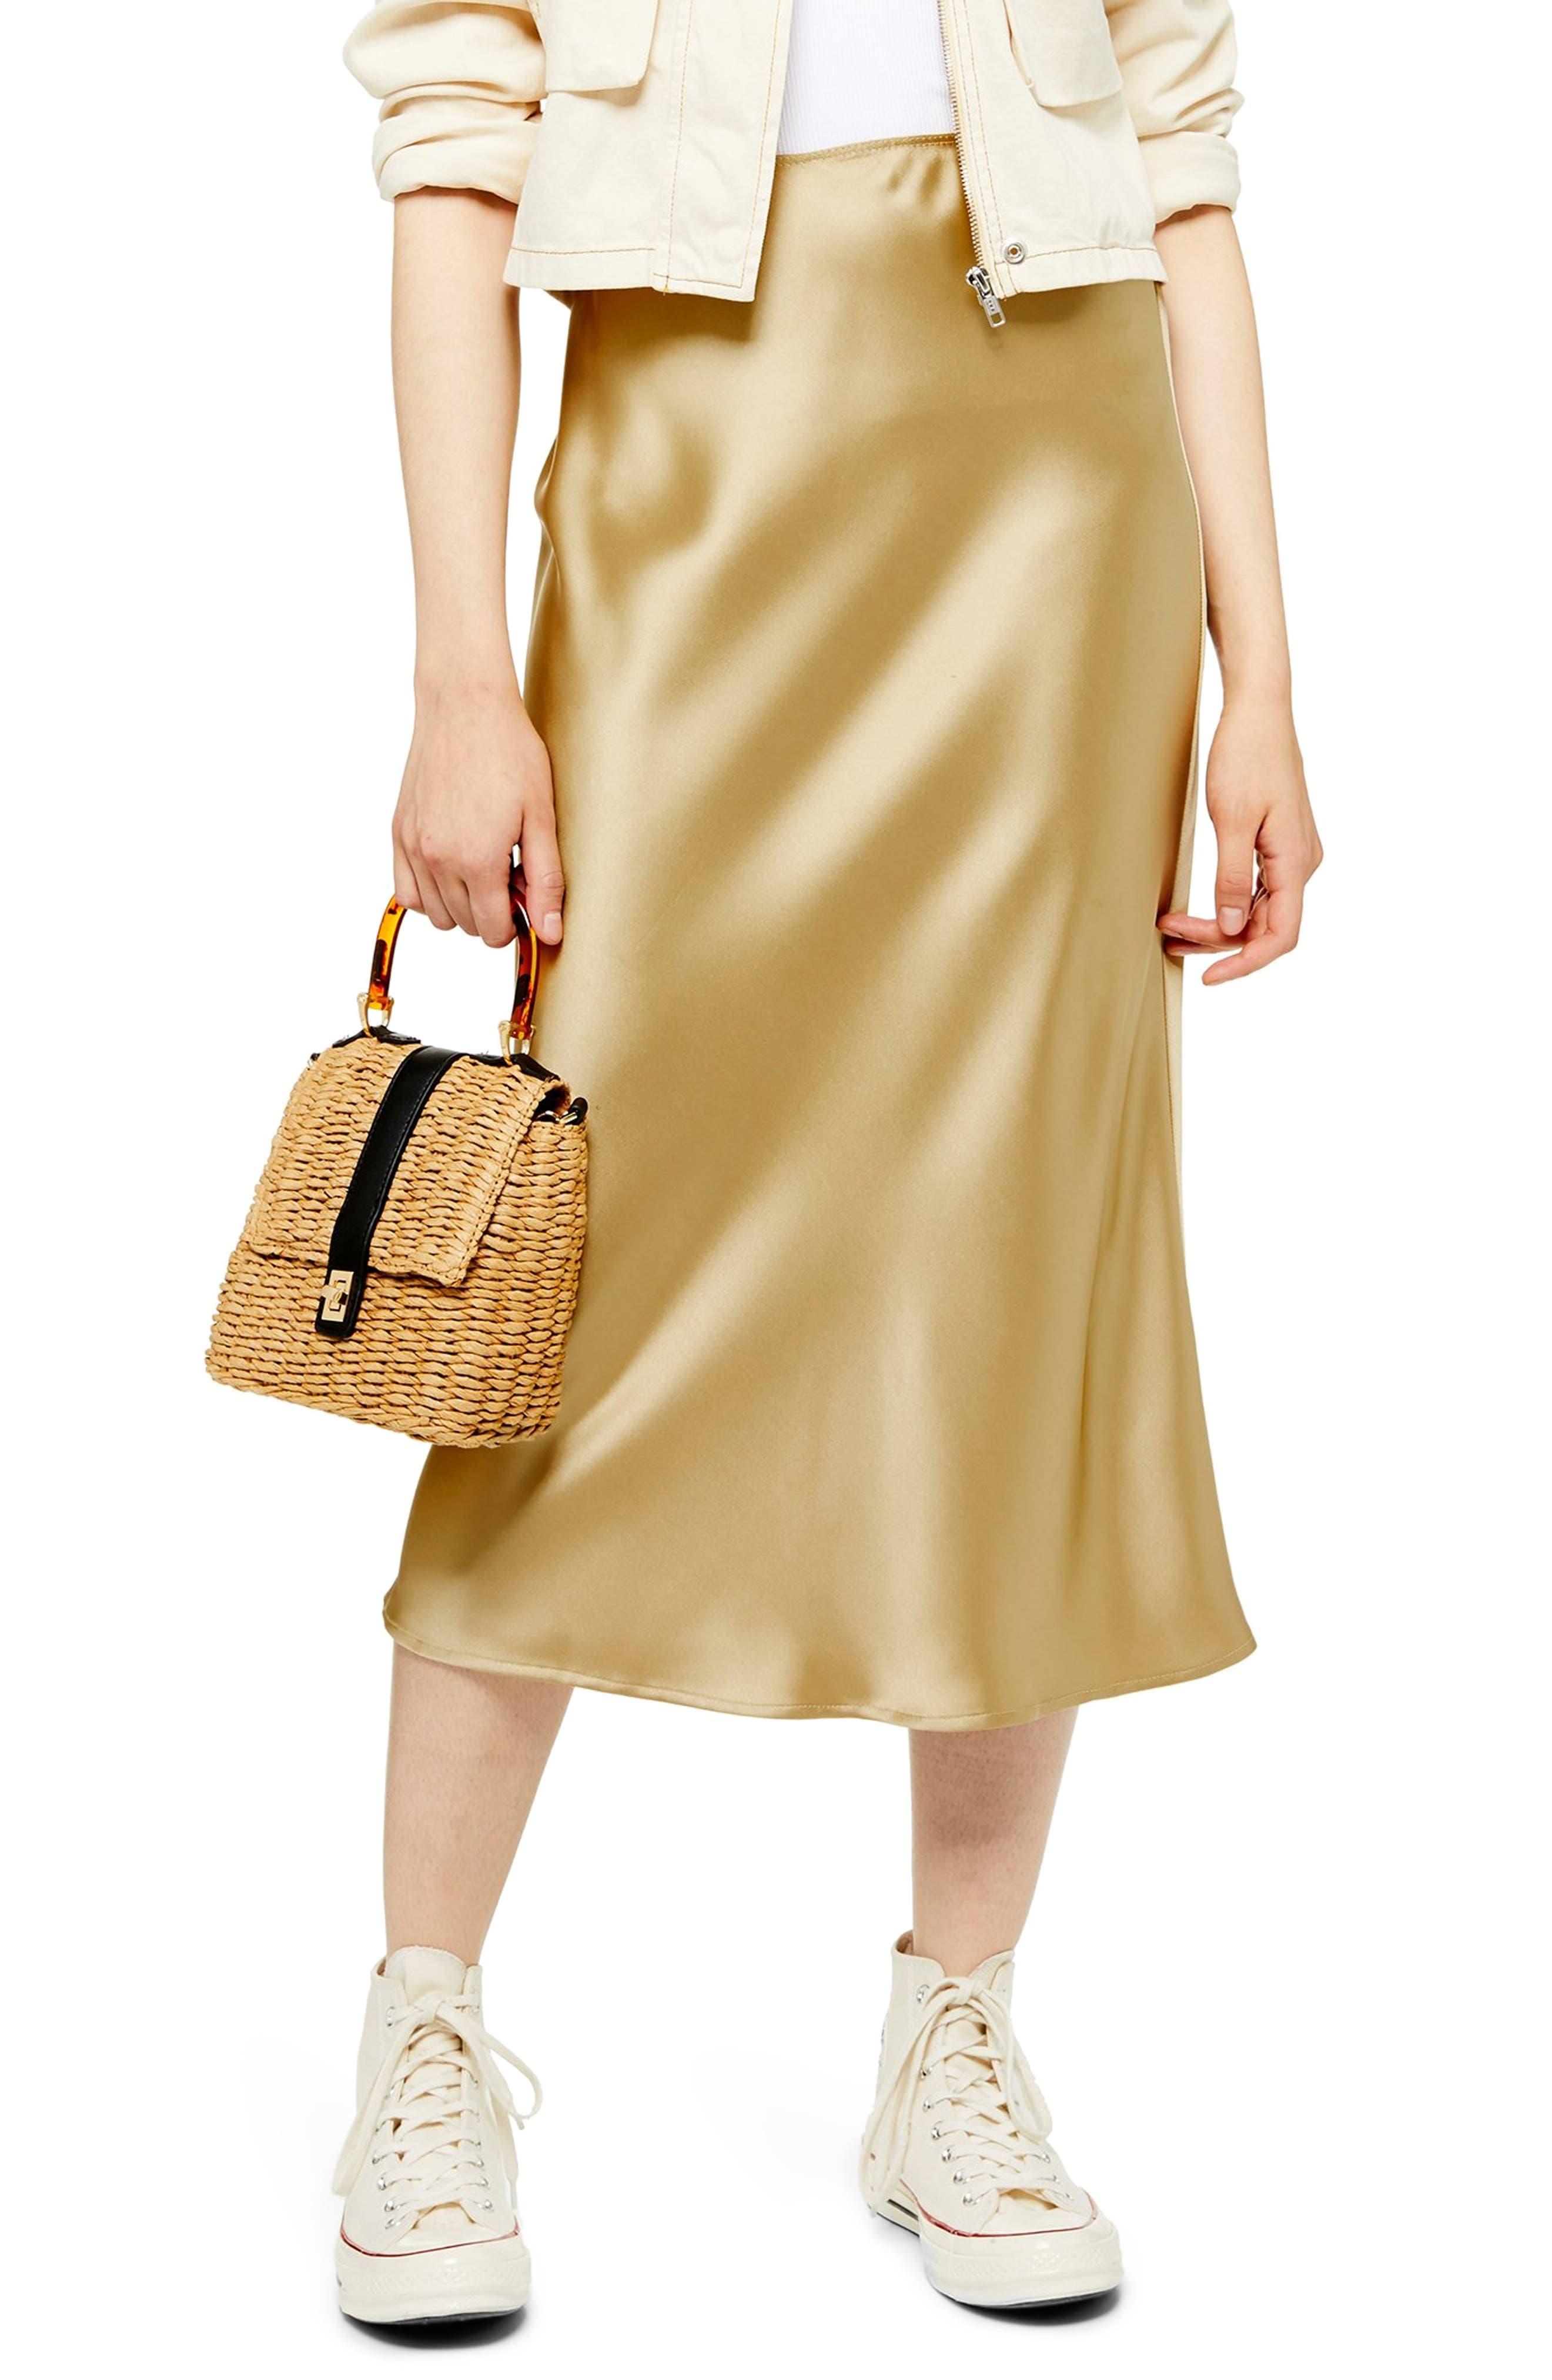 Topshop Satin Bias Midi Skirt, US (fits like 0-2) - Metallic